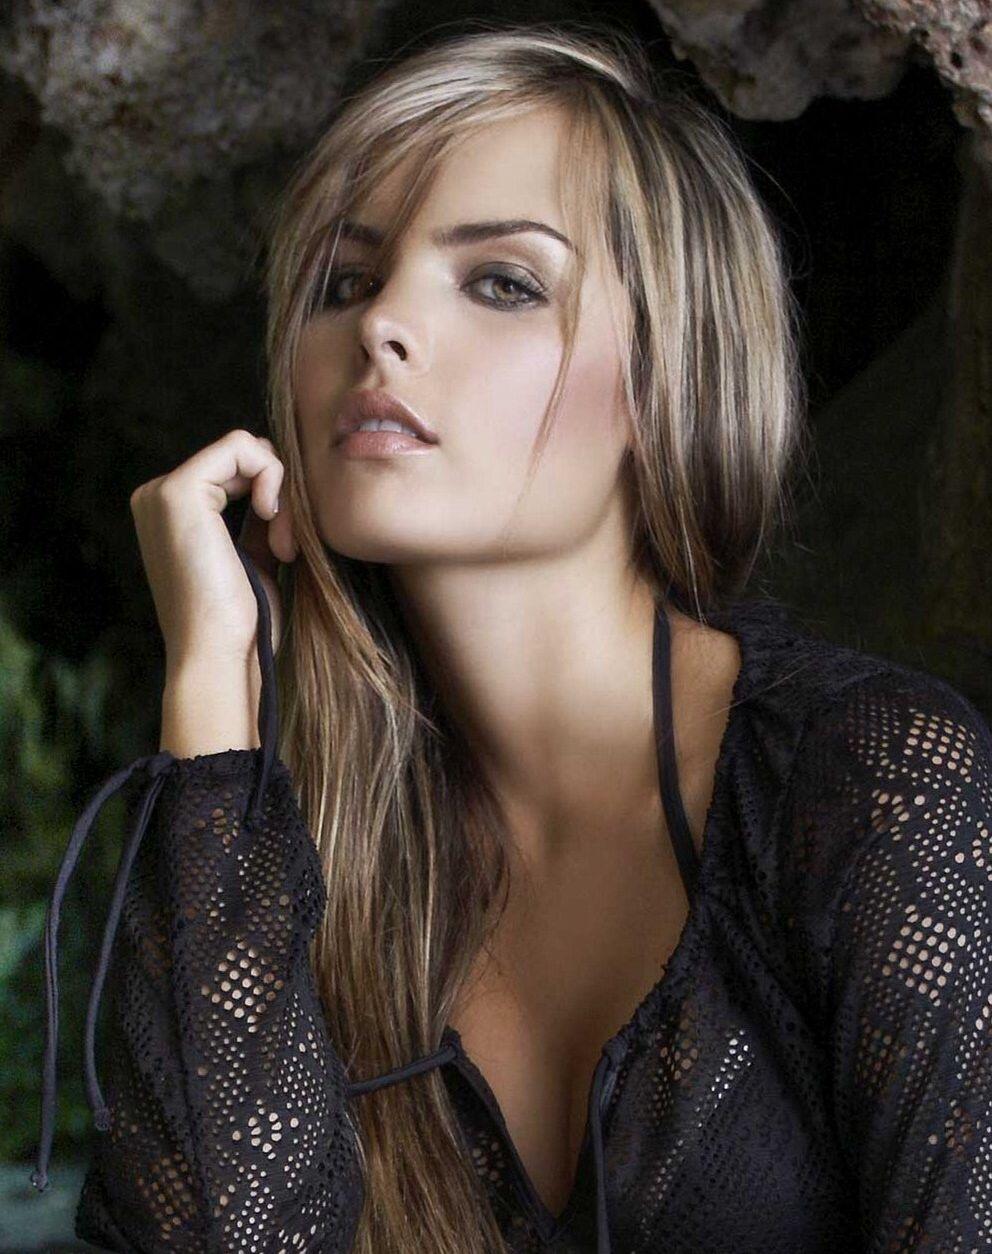 Melissa Giraldo Natural Visages Feminins Visage